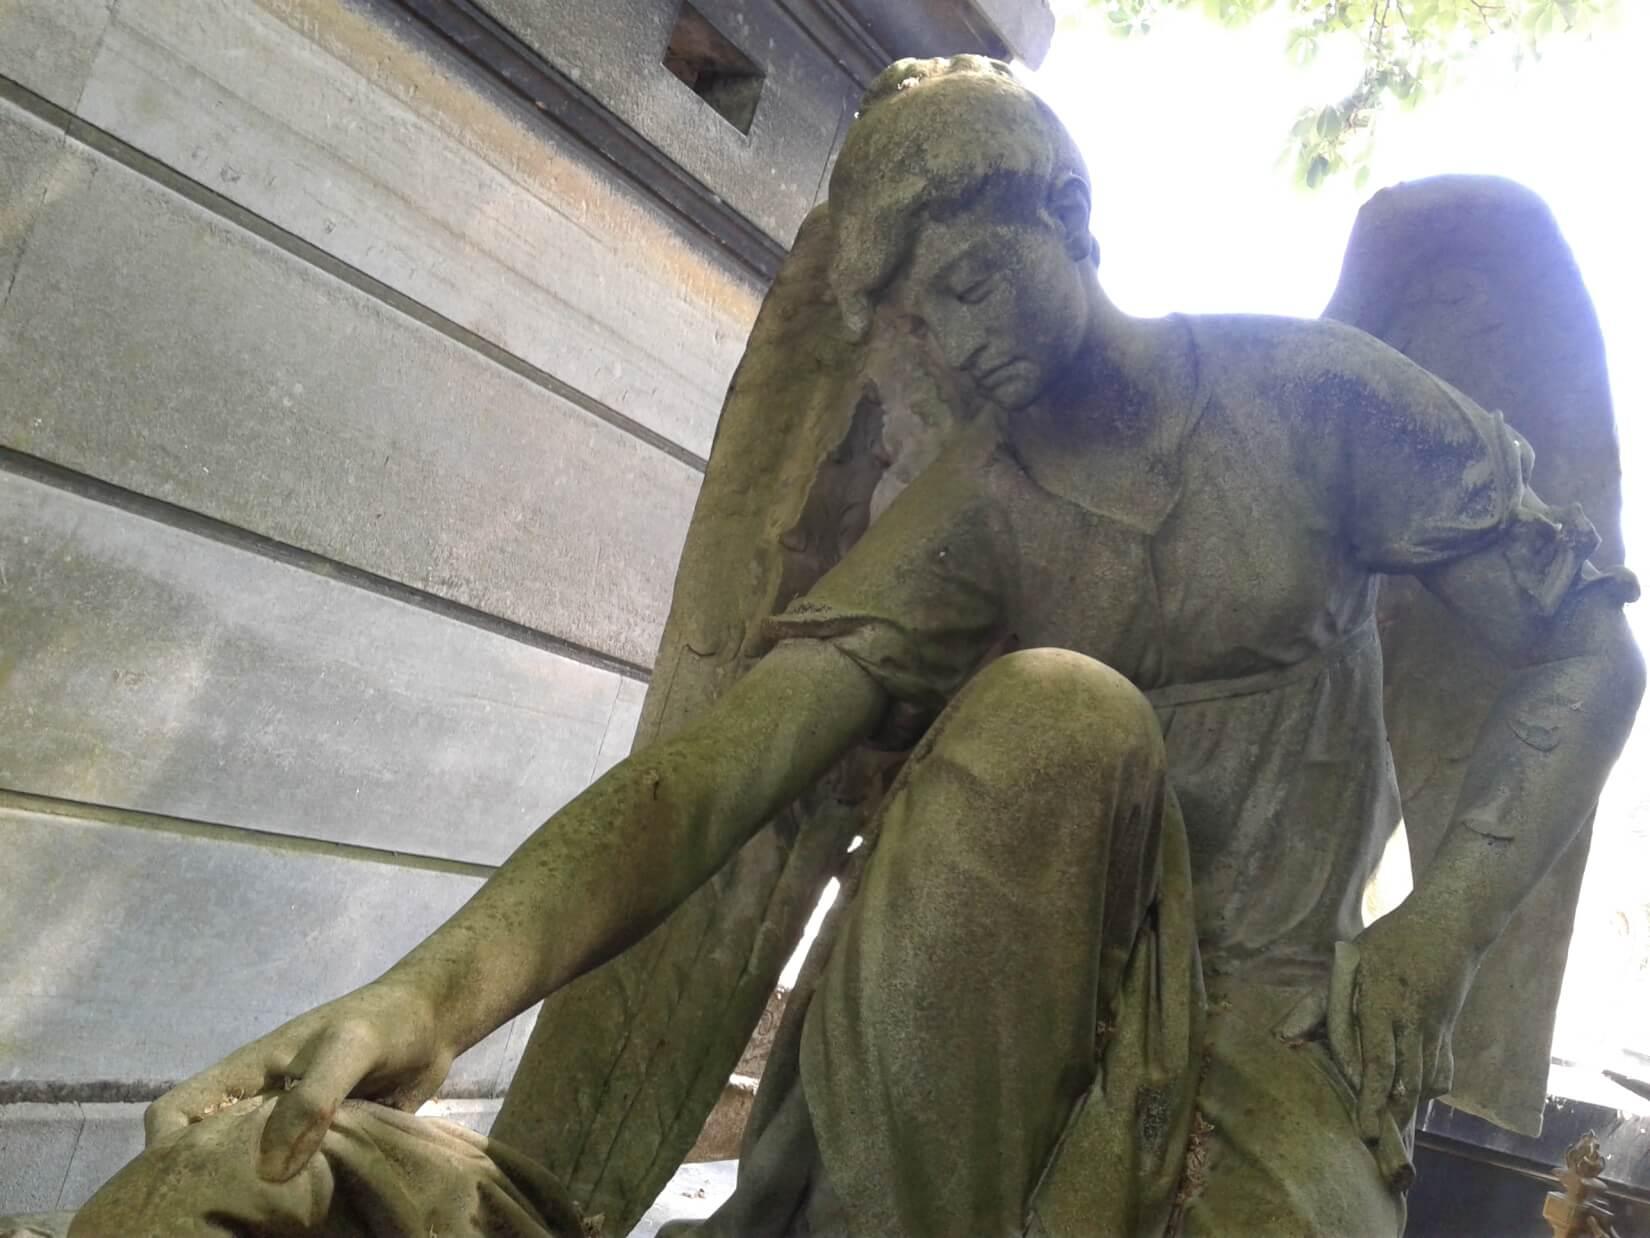 engel op begraafplaats